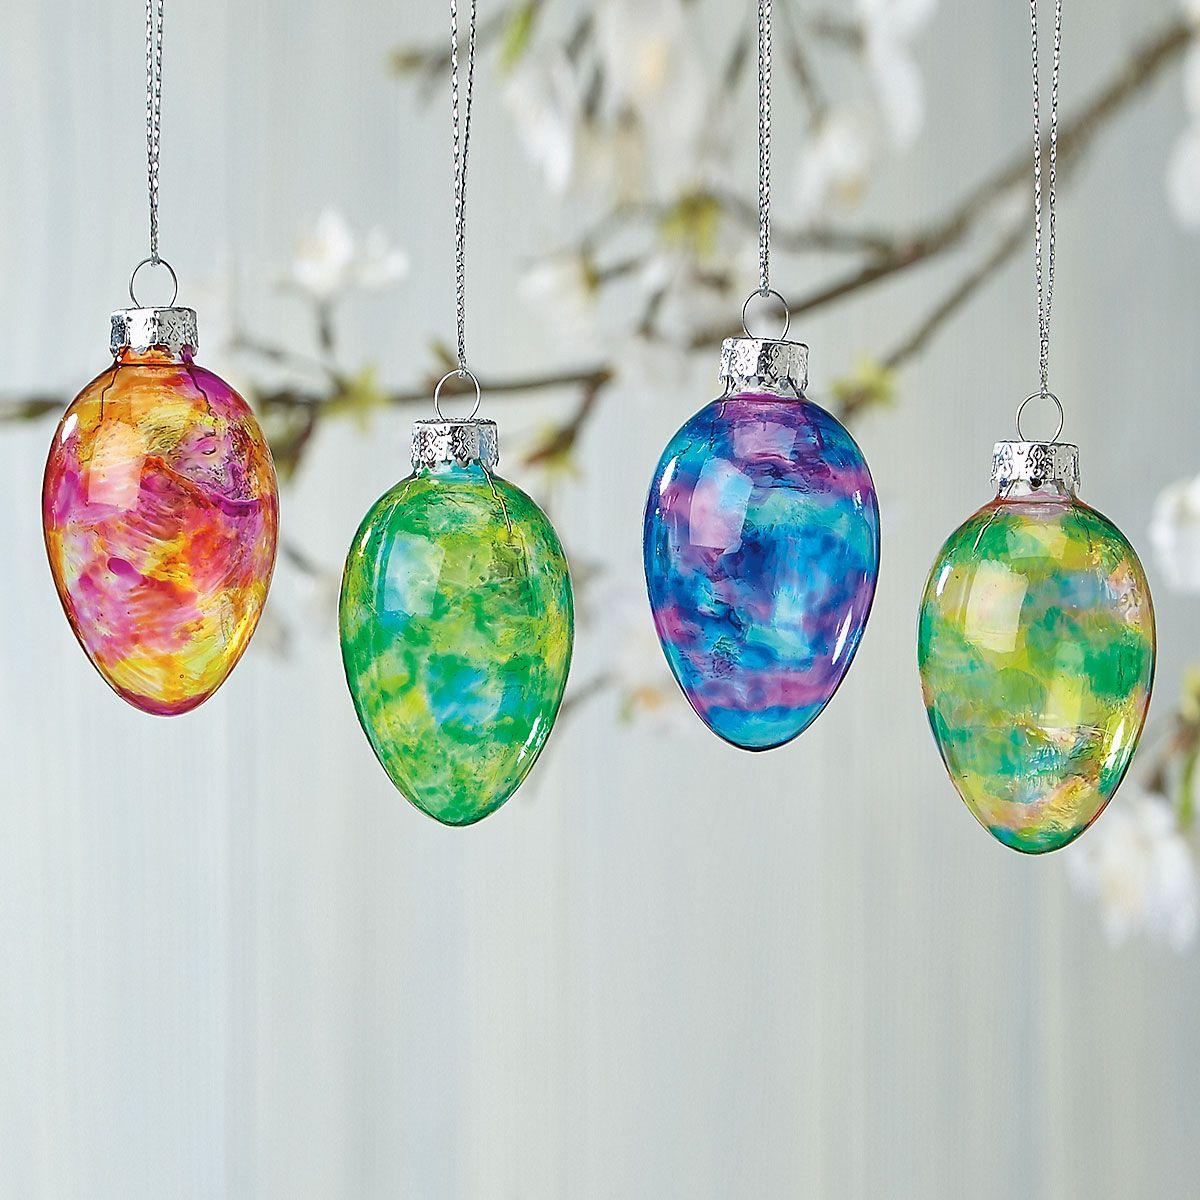 Glass Ornament Easter Eggs